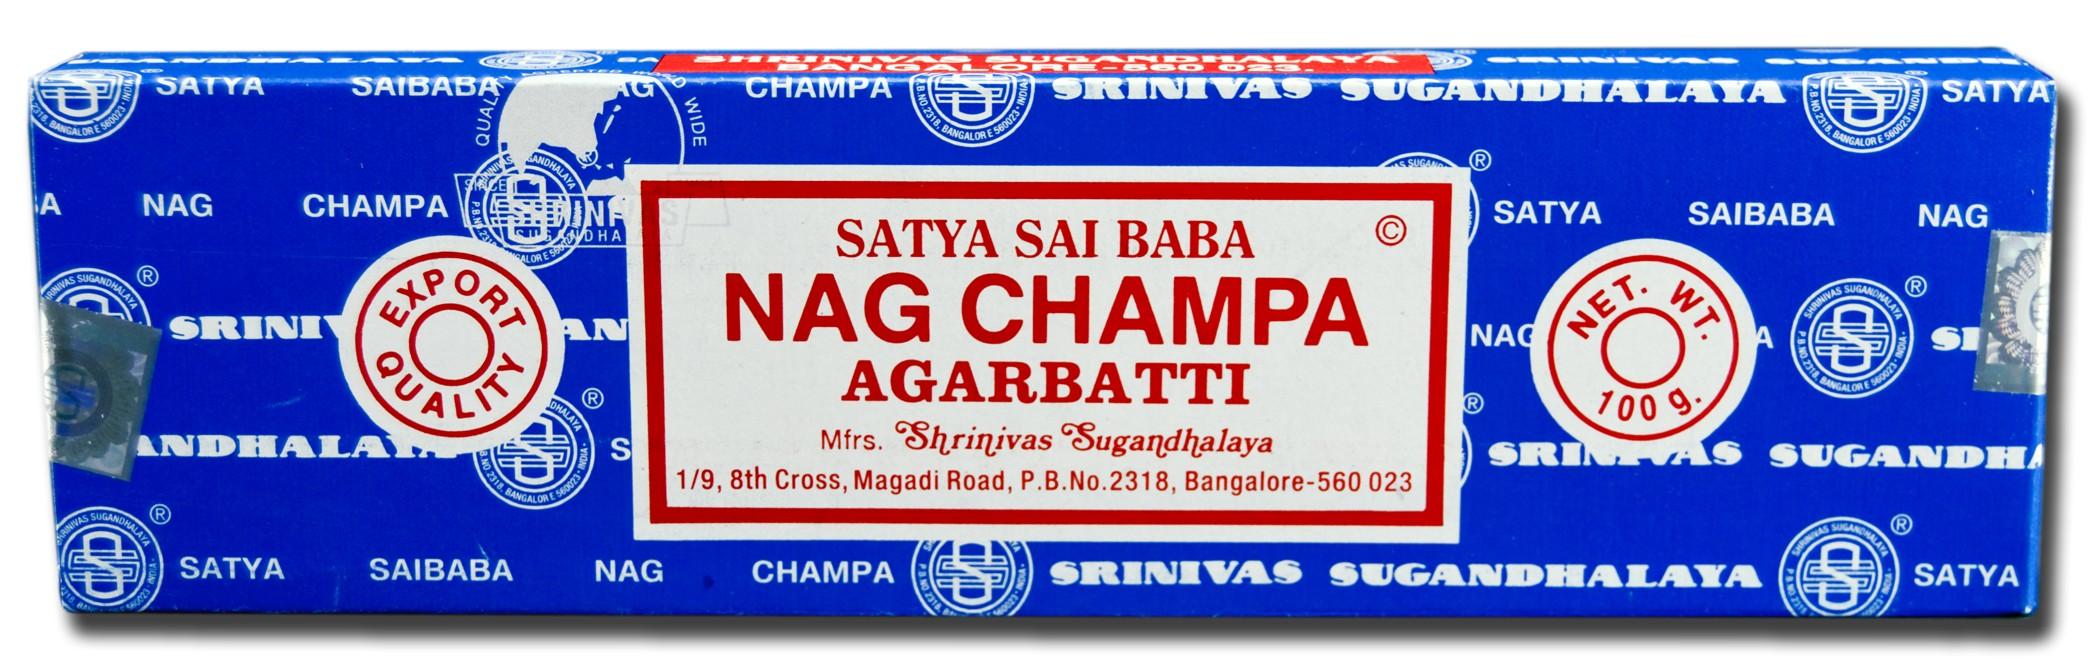 Certified Authentic Sai Baba Nag Champa Incense 250 Grams Approx 250 Sticks Nci 250